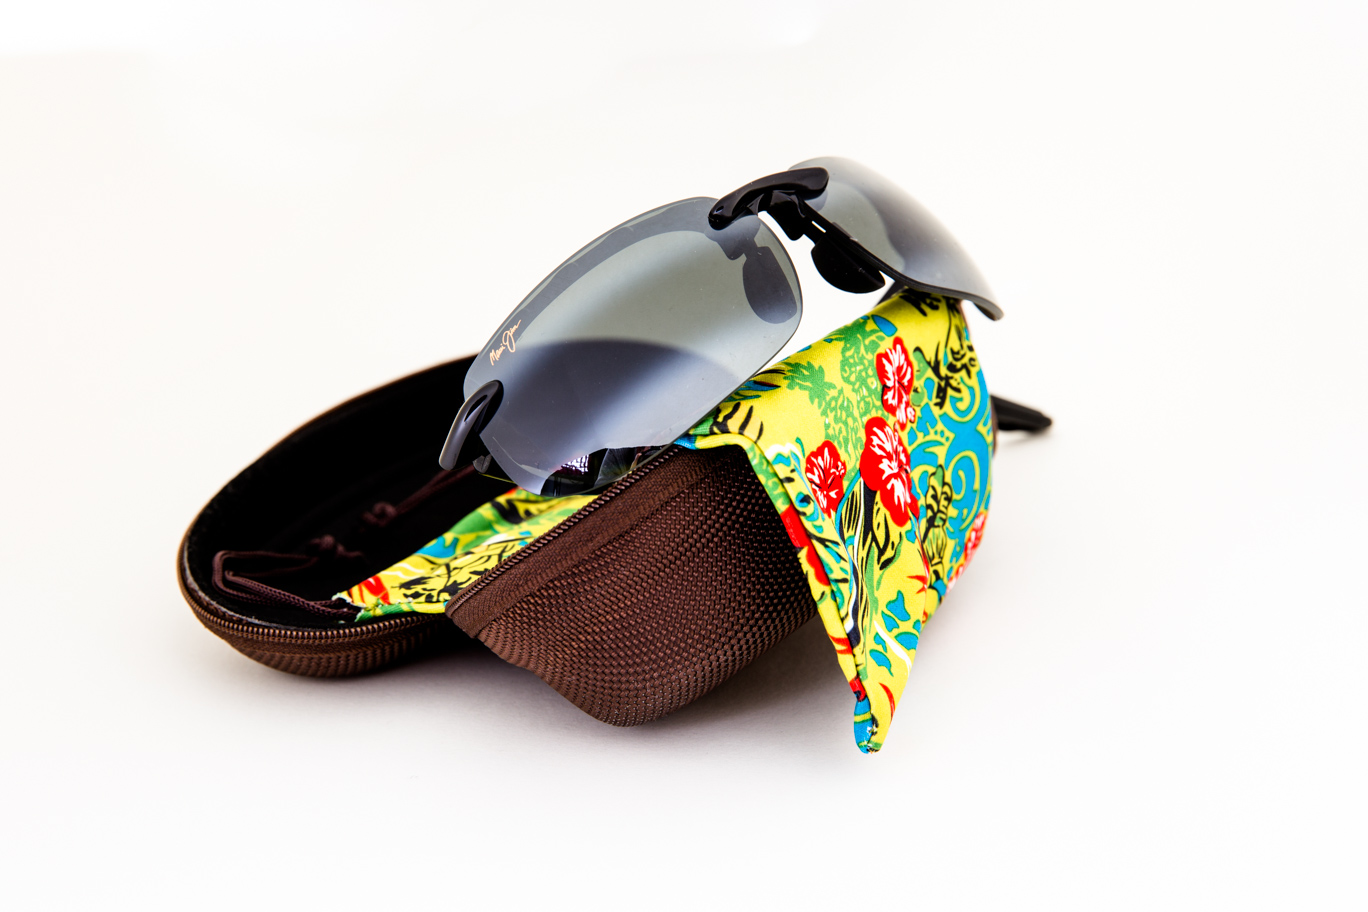 Maui Jim Banyans Sunglasses. Donated by Lexus of Fife.